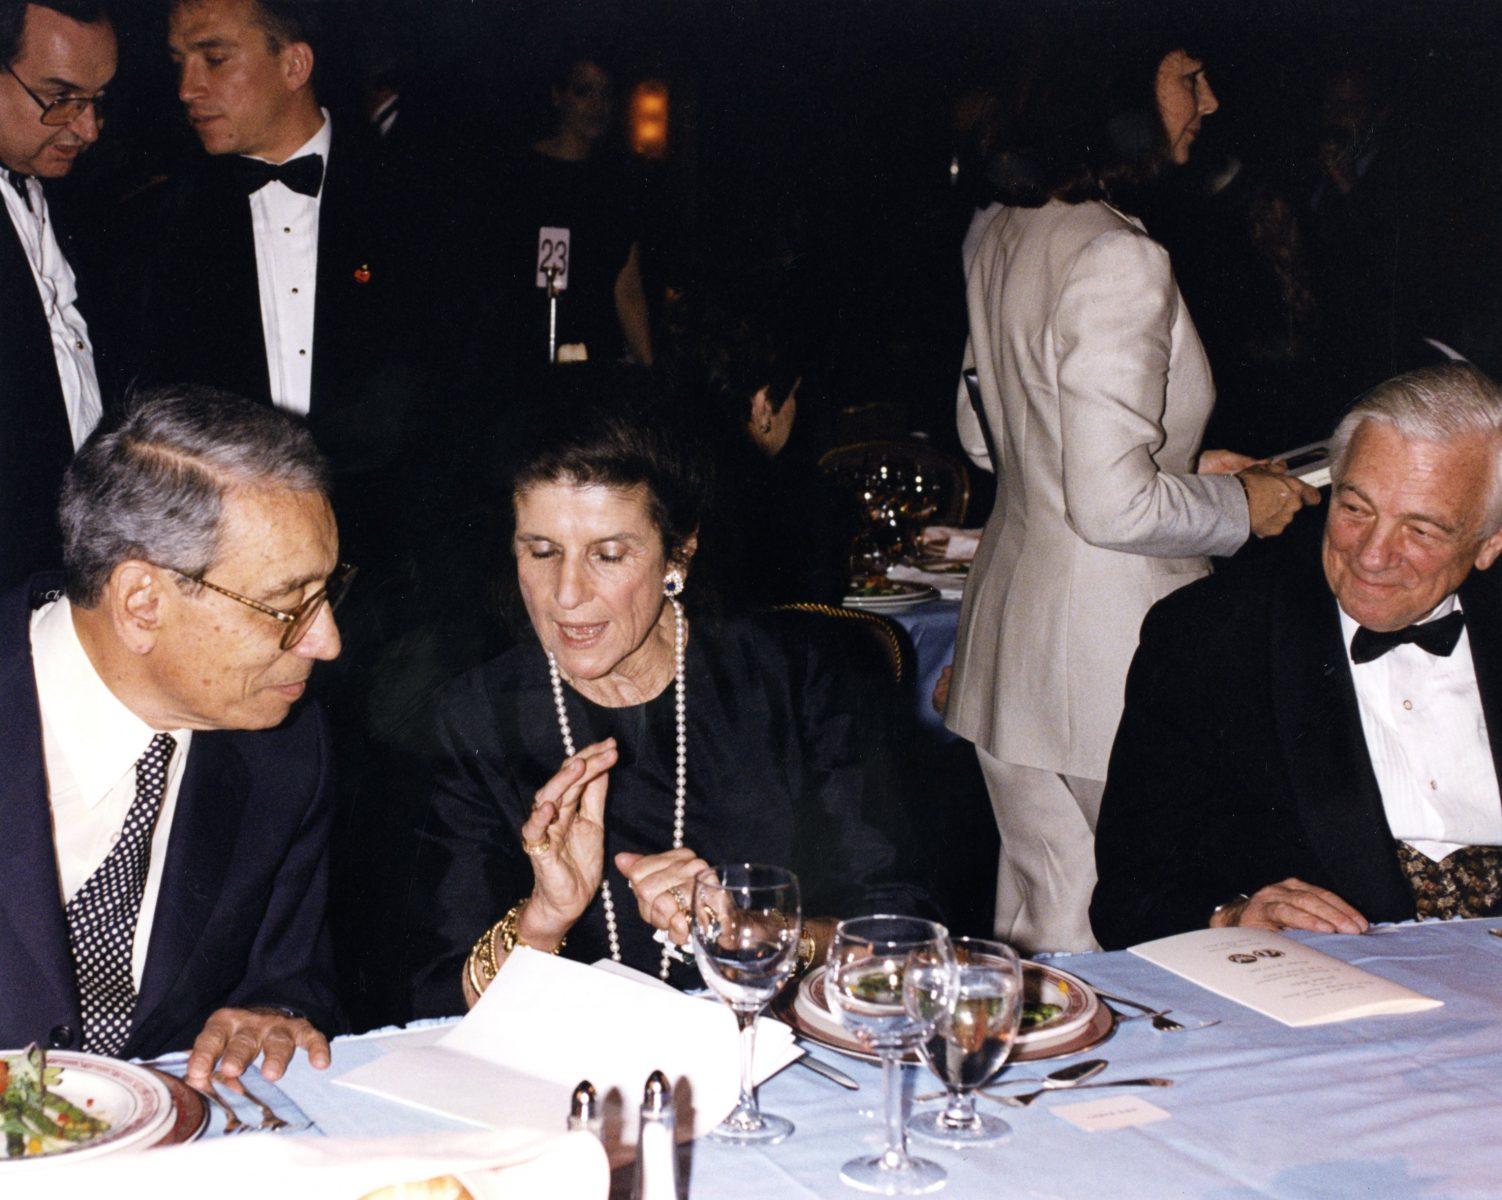 Boutros Boutros Ghali, Lea Rabin and John C. Whitehead